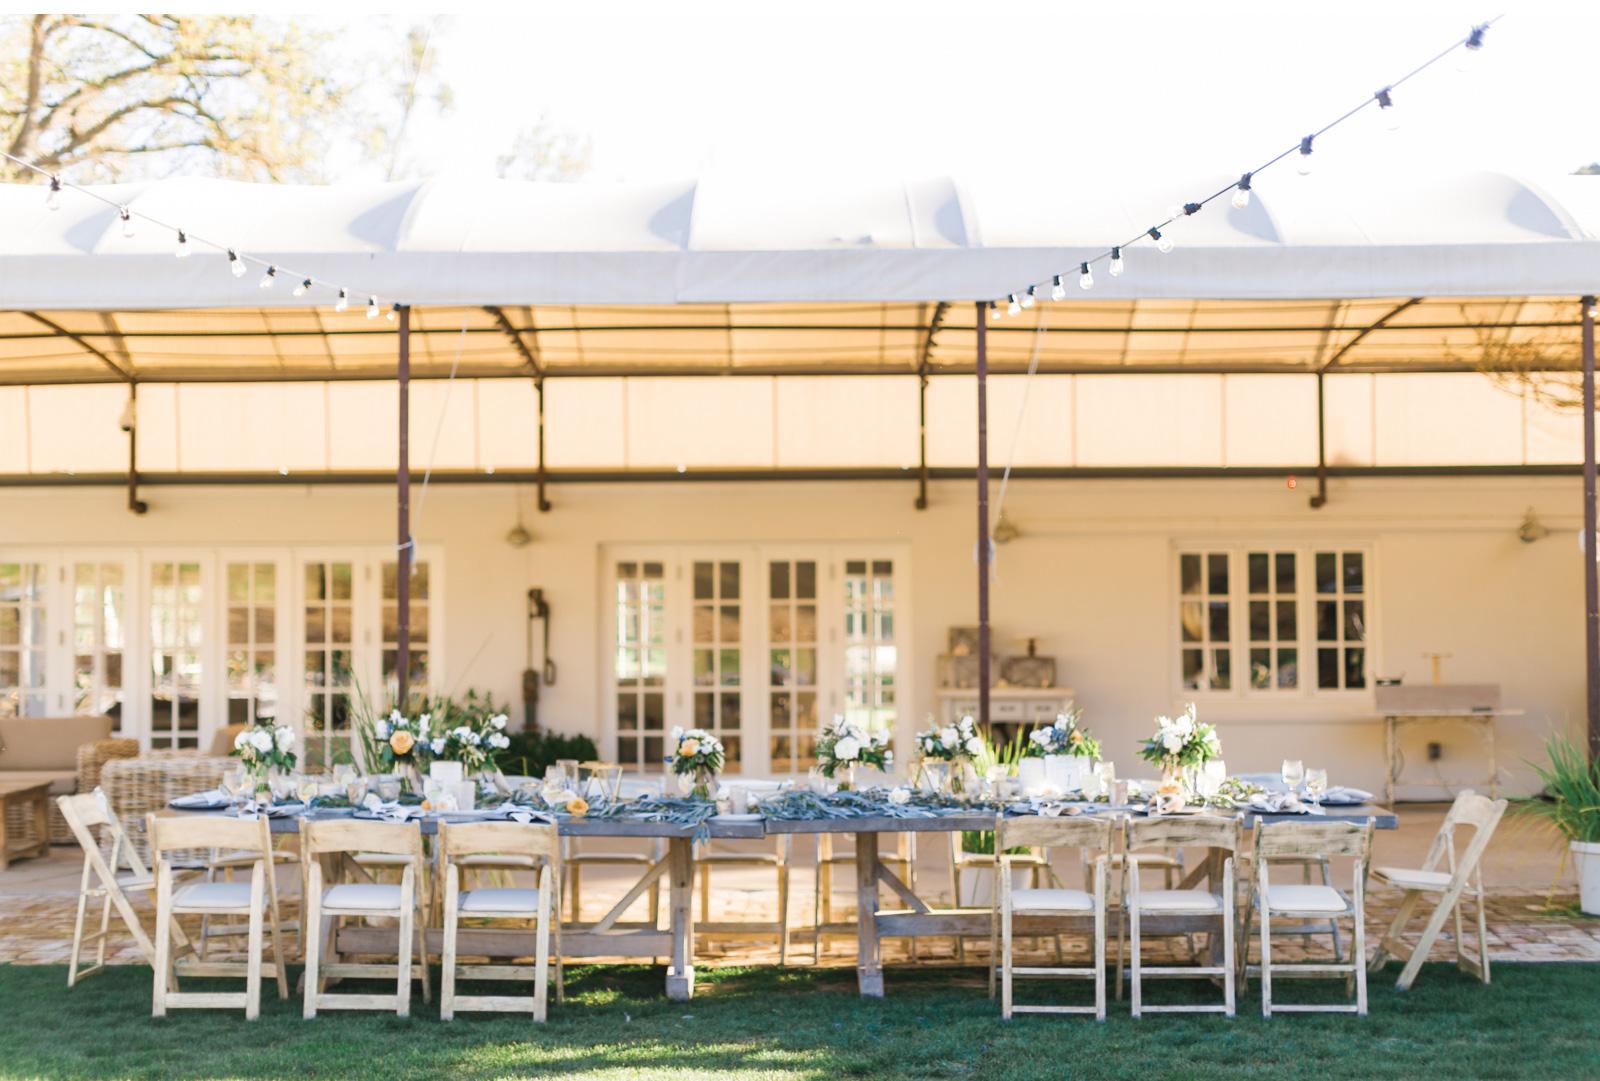 Triunfo-Creek-Malibu-Wedding-Natalie-Schutt-Photography-Couture-Events-Style-Me-Pretty_16.jpg